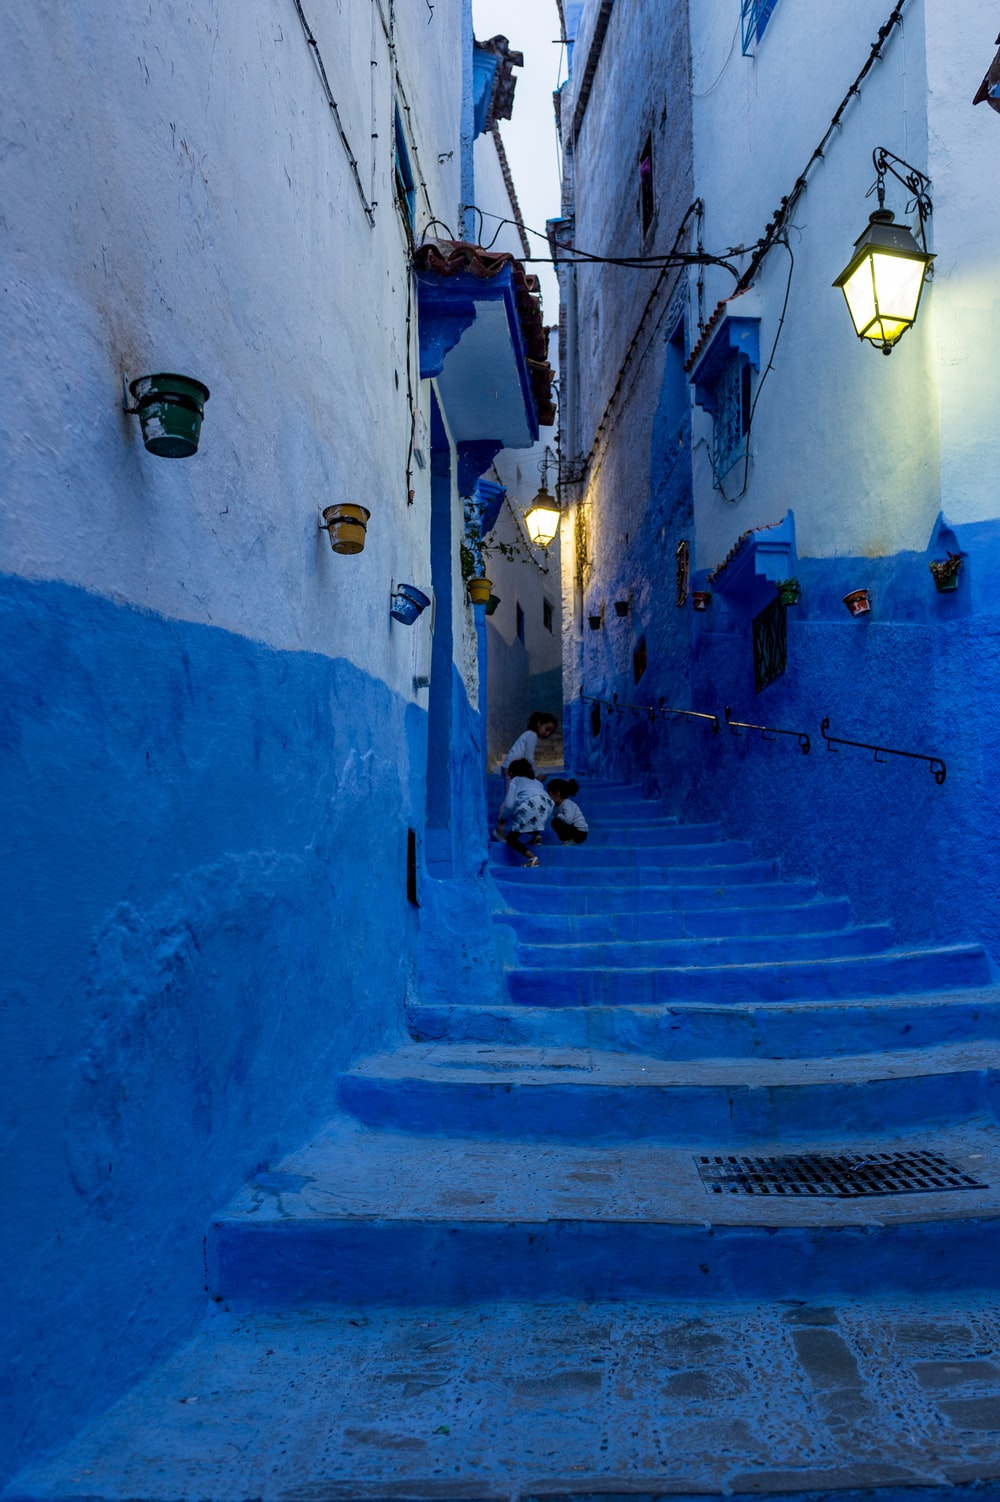 children climbing up blue stairs